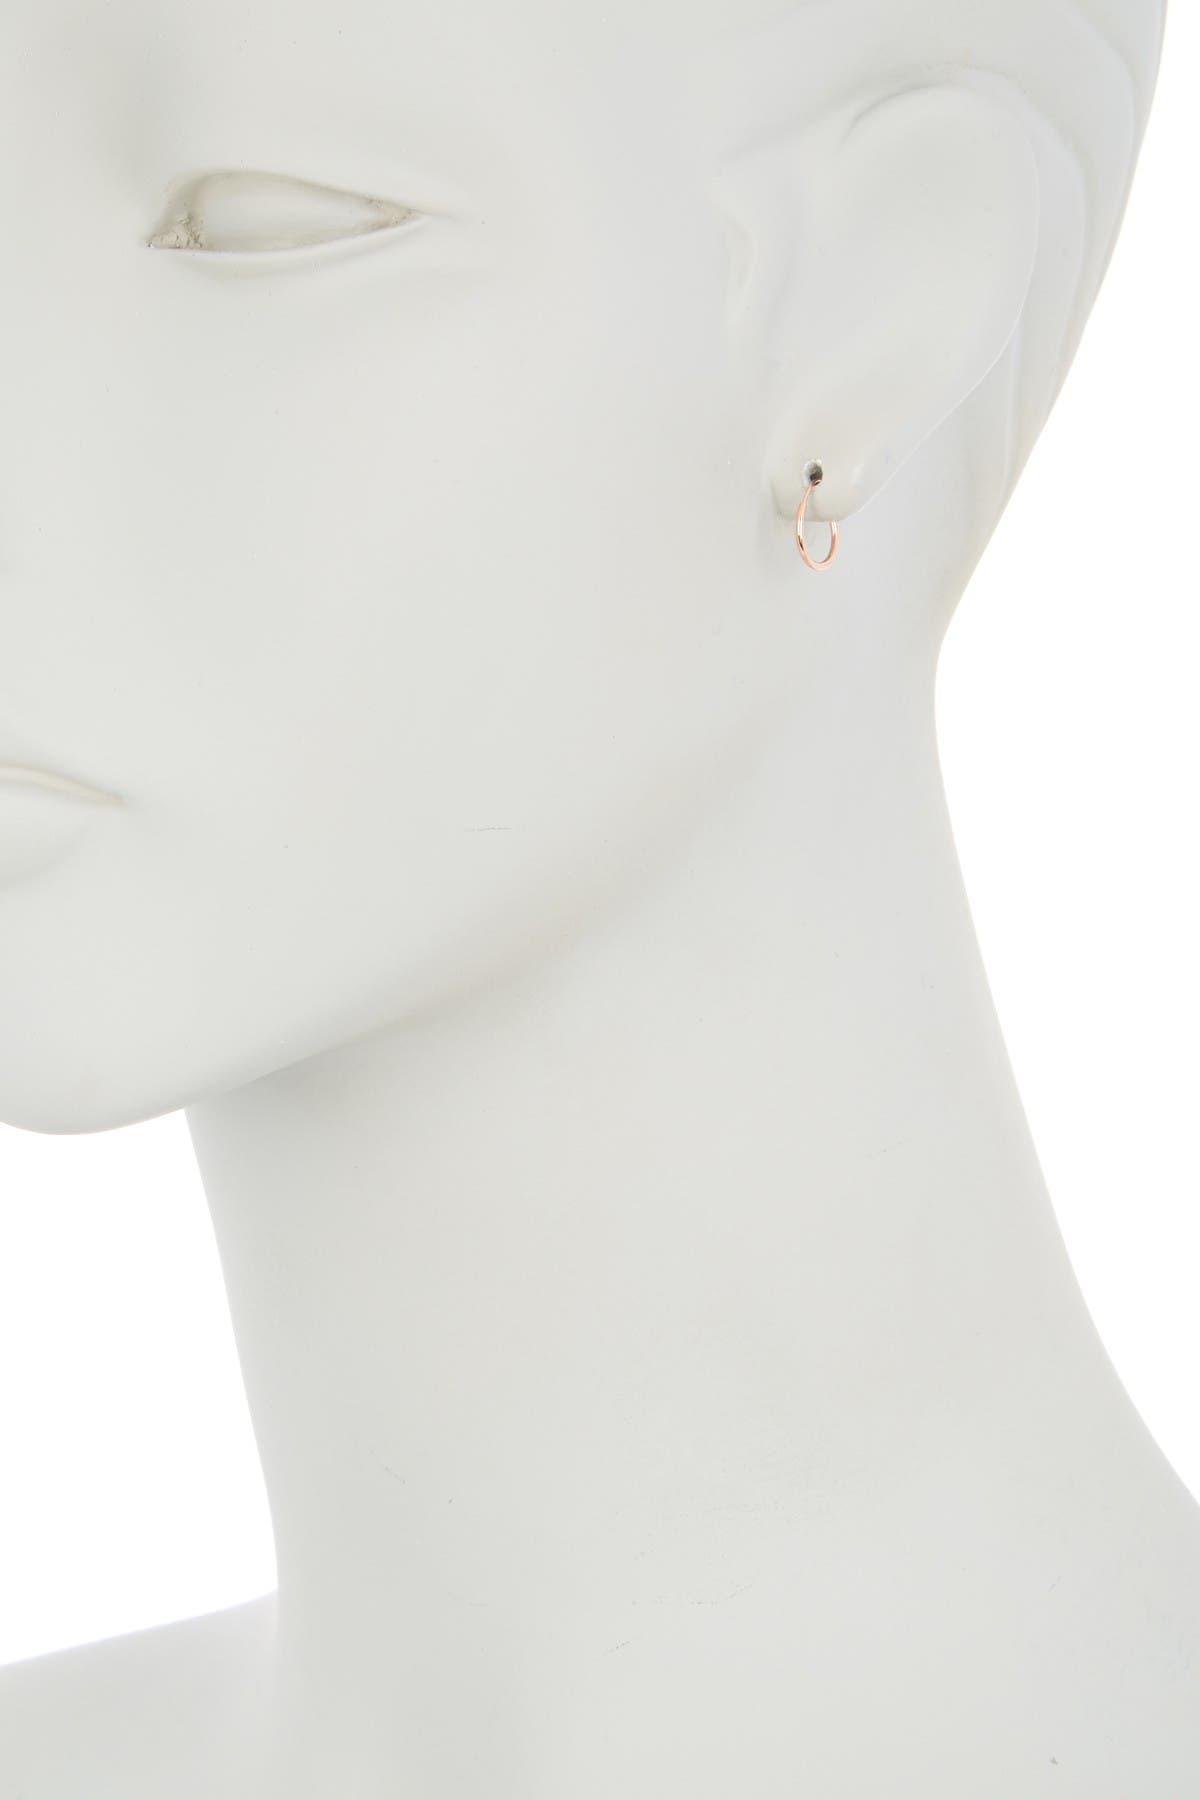 Candela 14K Rose Gold 10mm Endless Hoop Earrings